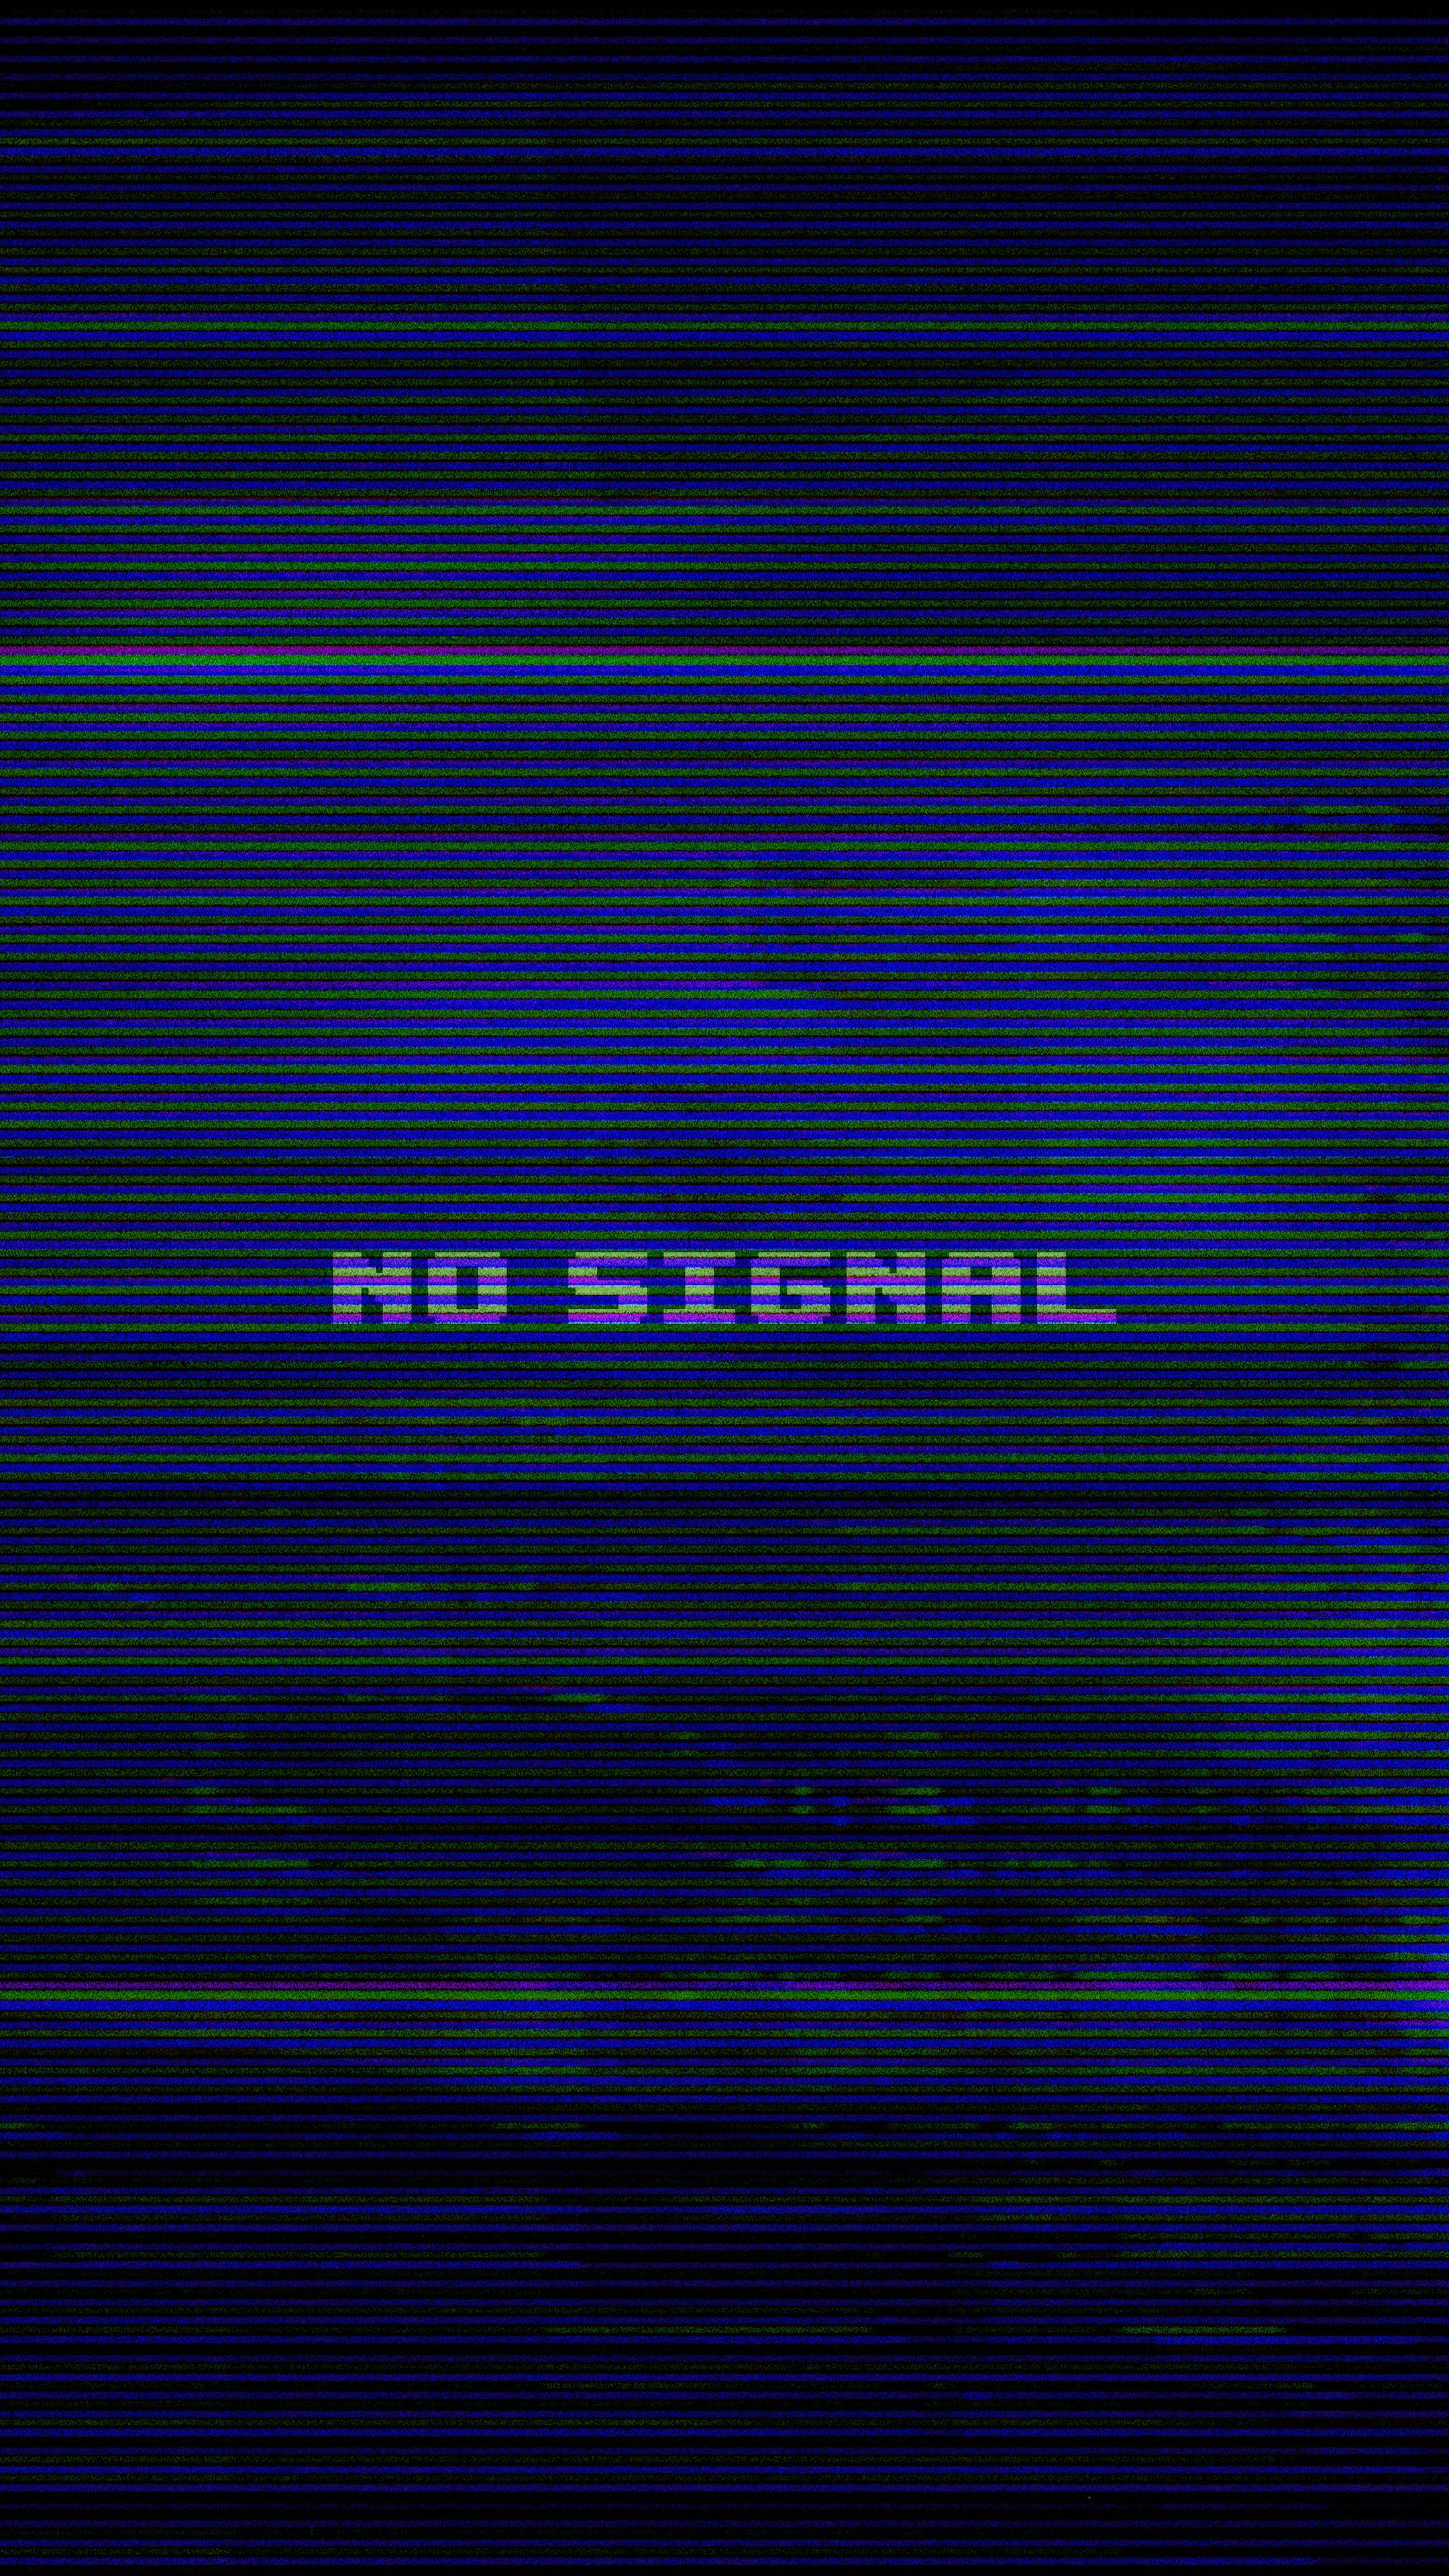 no-signal-typography-4k-2n.jpg